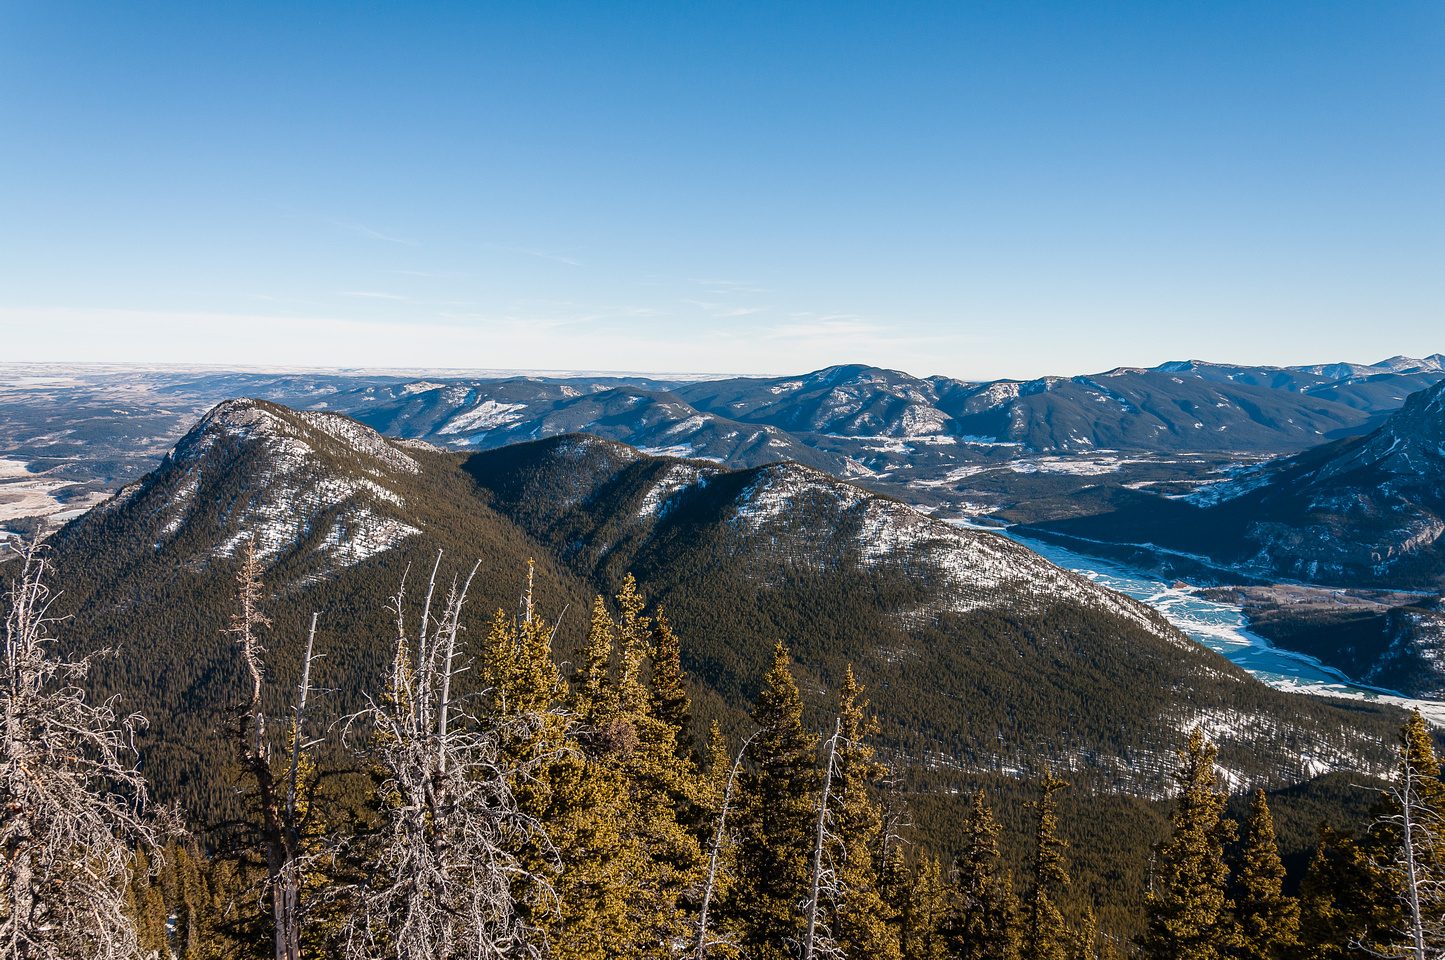 Views of Yate's Mountain, Barrier Lake and Lusk Ridge.